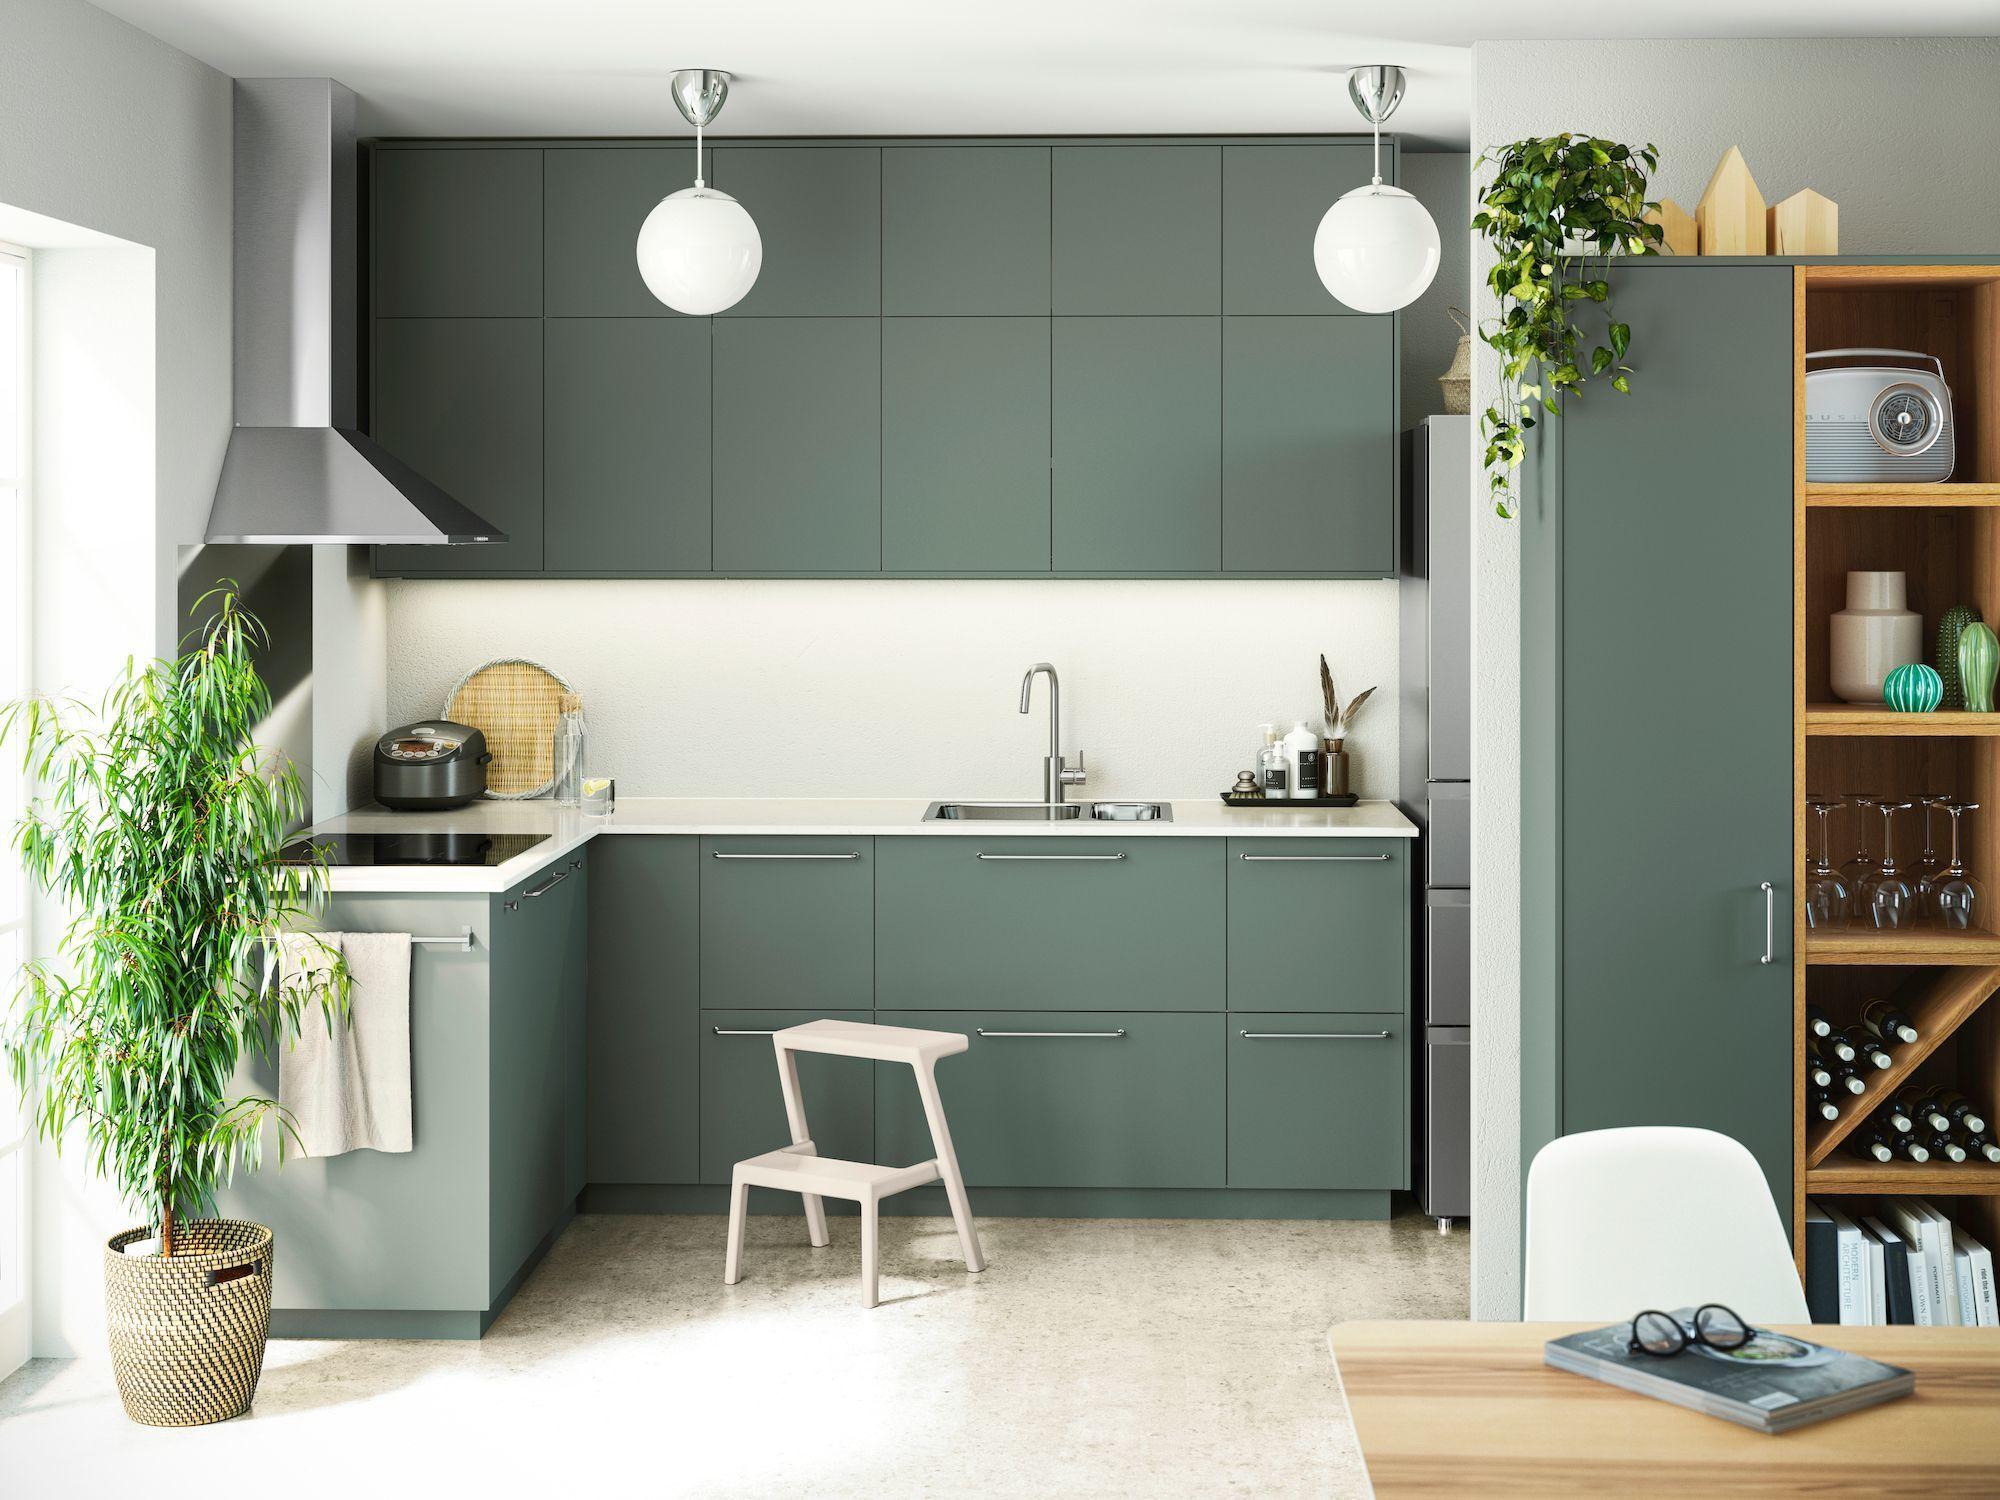 Le cucine Ikea 2020 in immagini